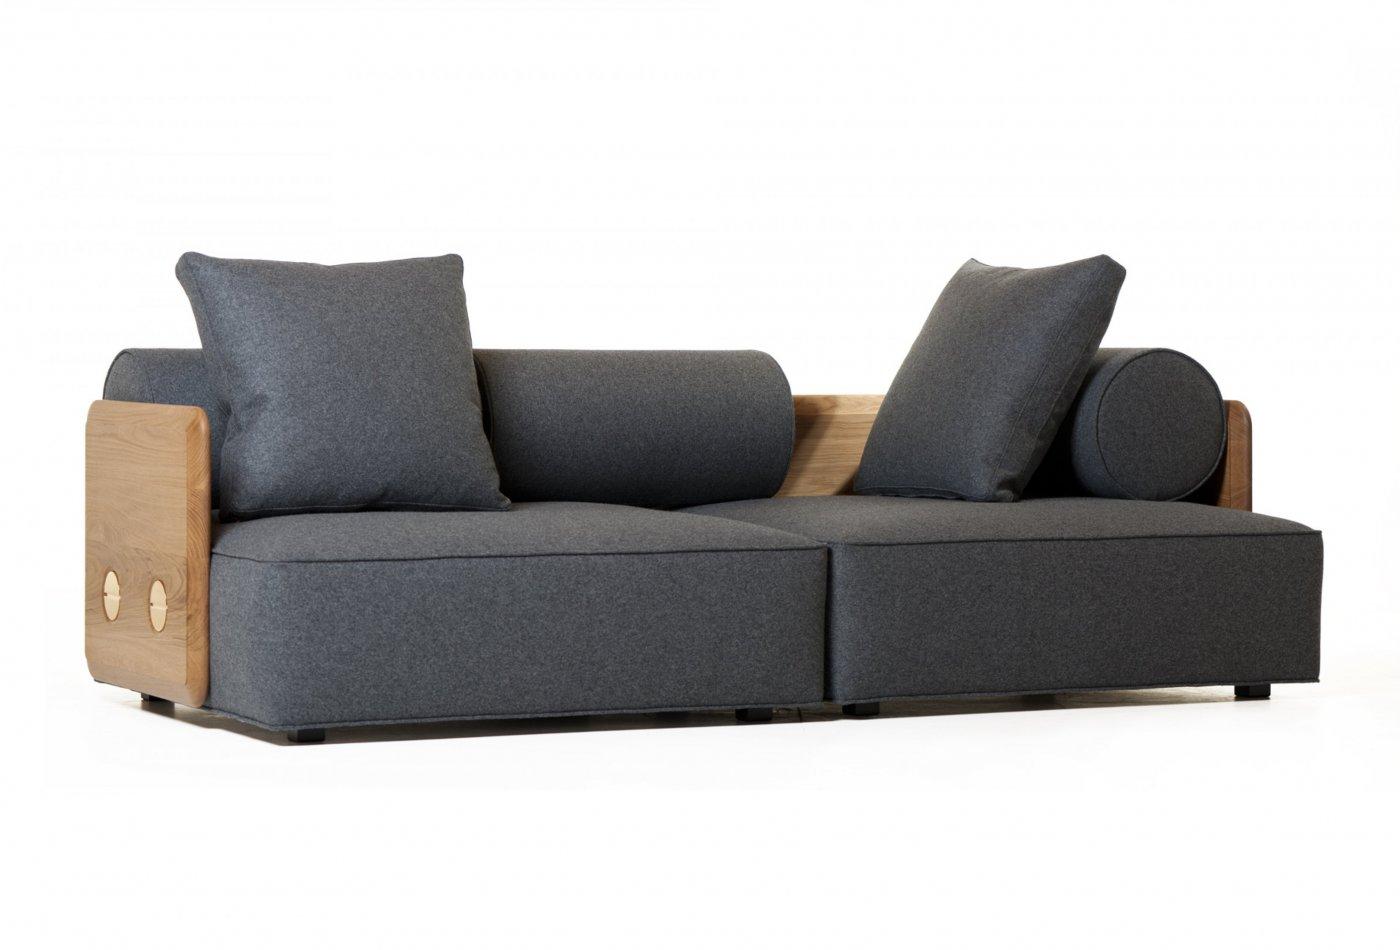 Deco Sofa profile in Danish oiled oak and wool